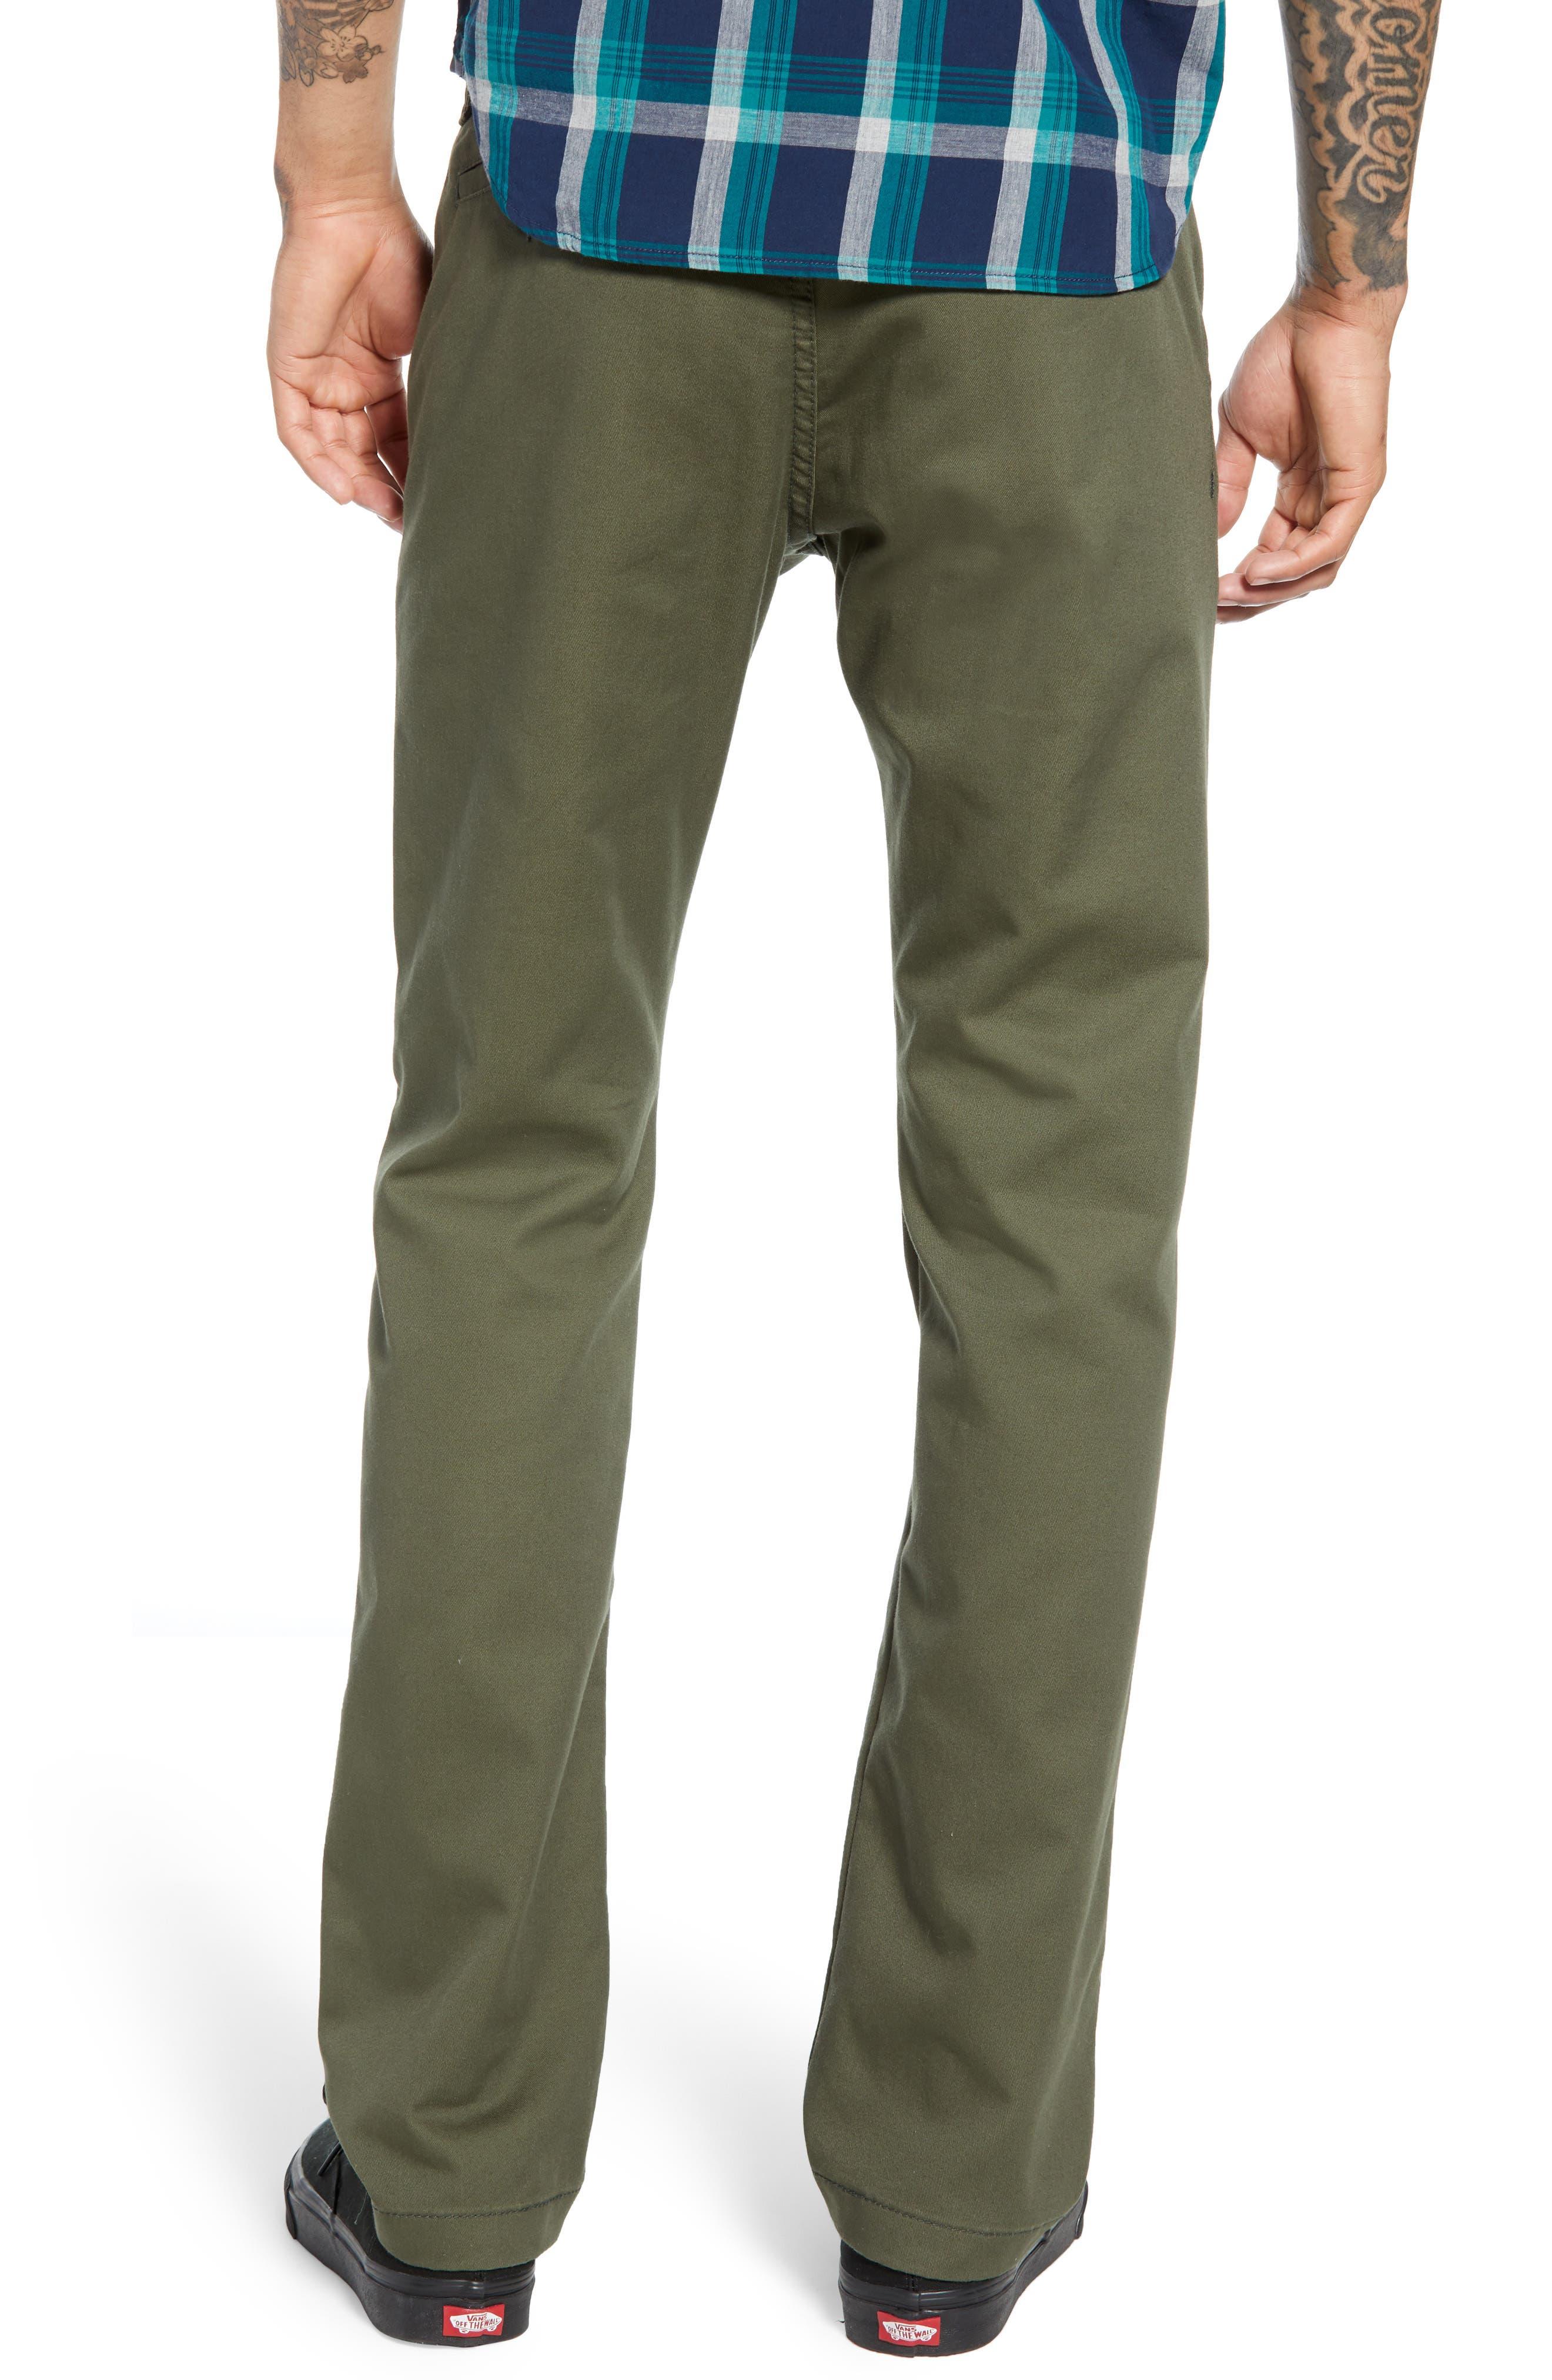 20451d15b5 Men s Vans Chinos   Khaki Pants